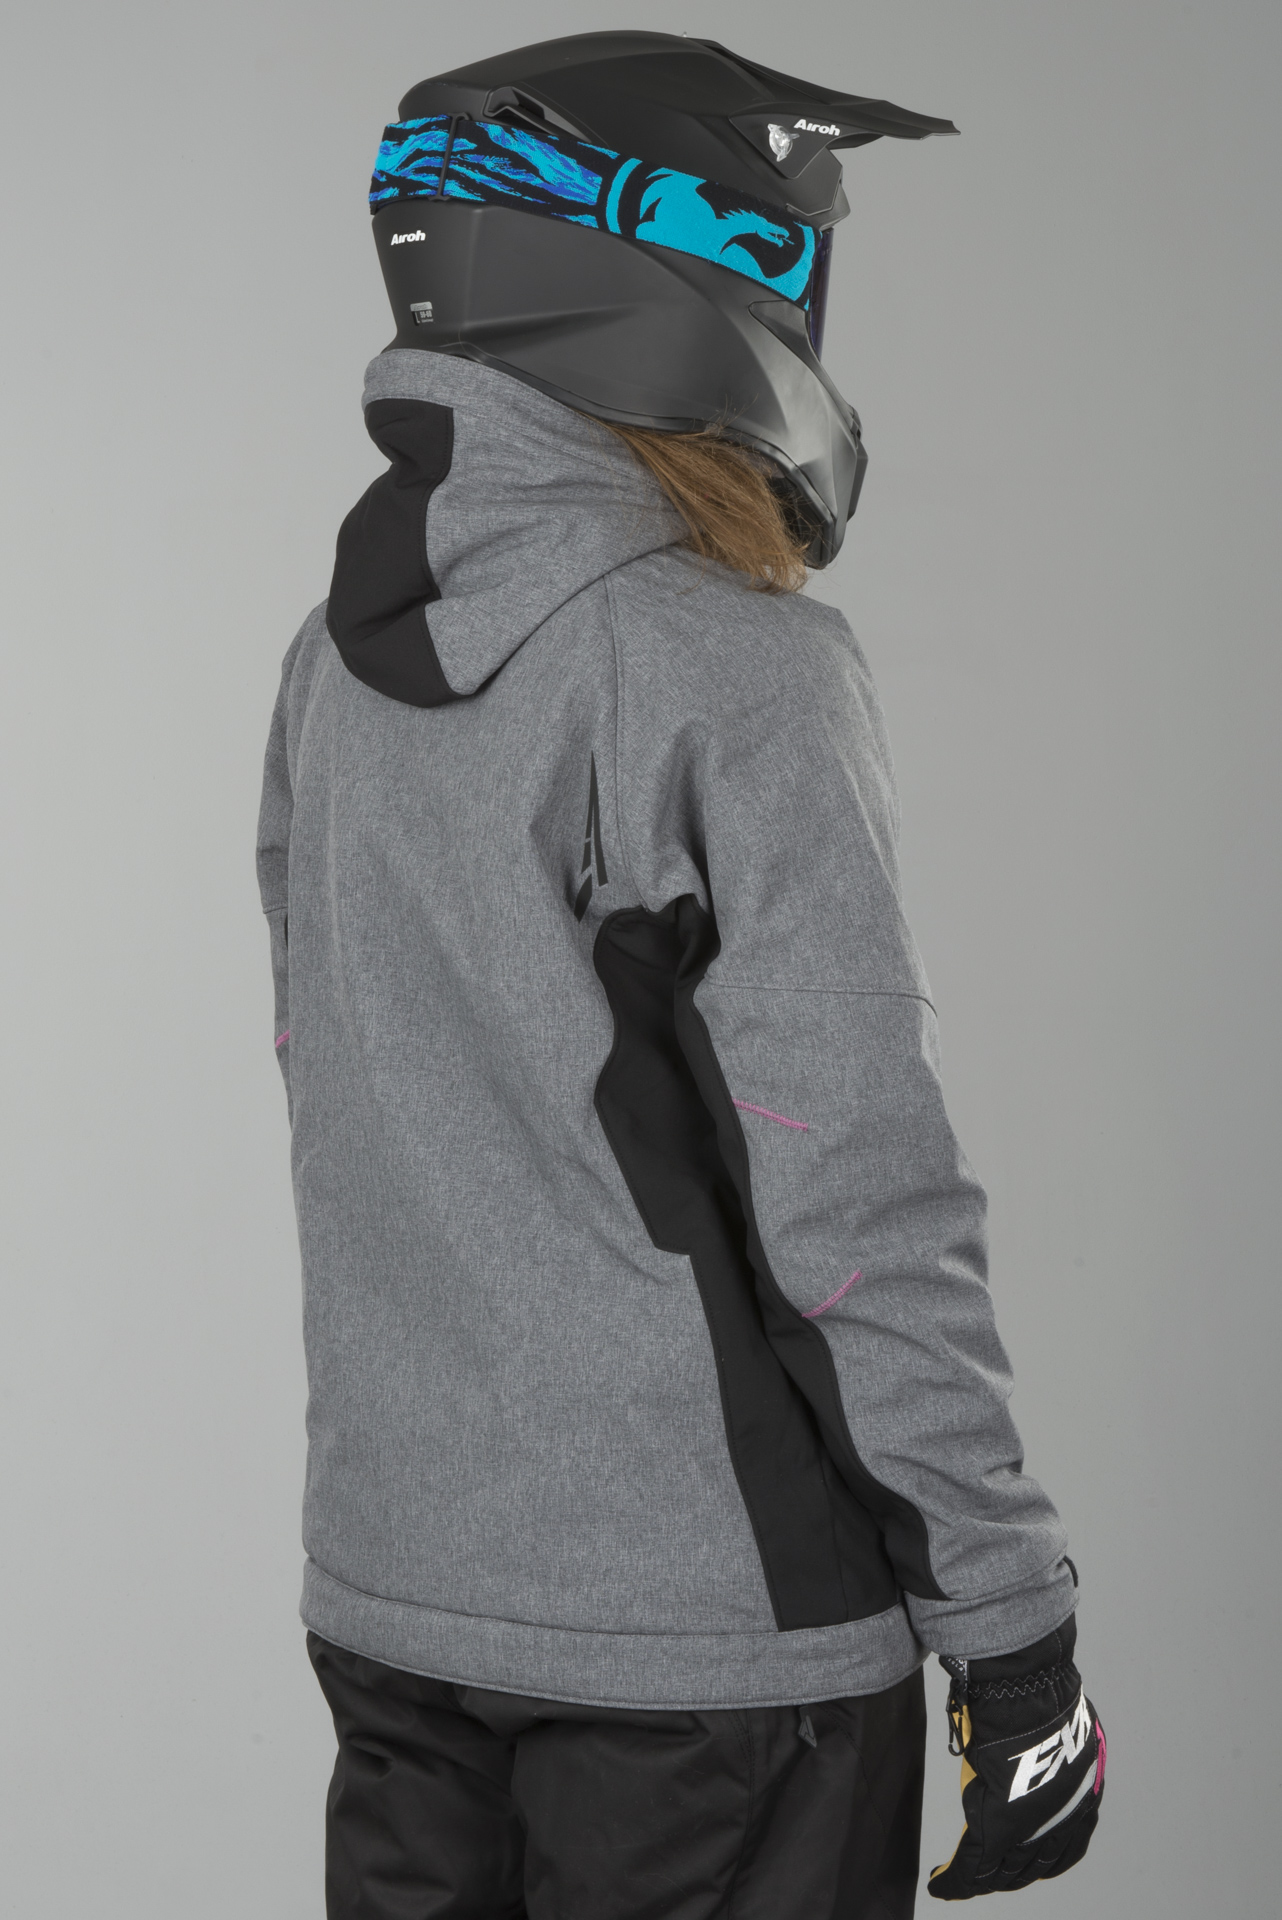 Jakke FXR Vertical Pro Softshell Dam Grå Fuchsia Nå 8% Du